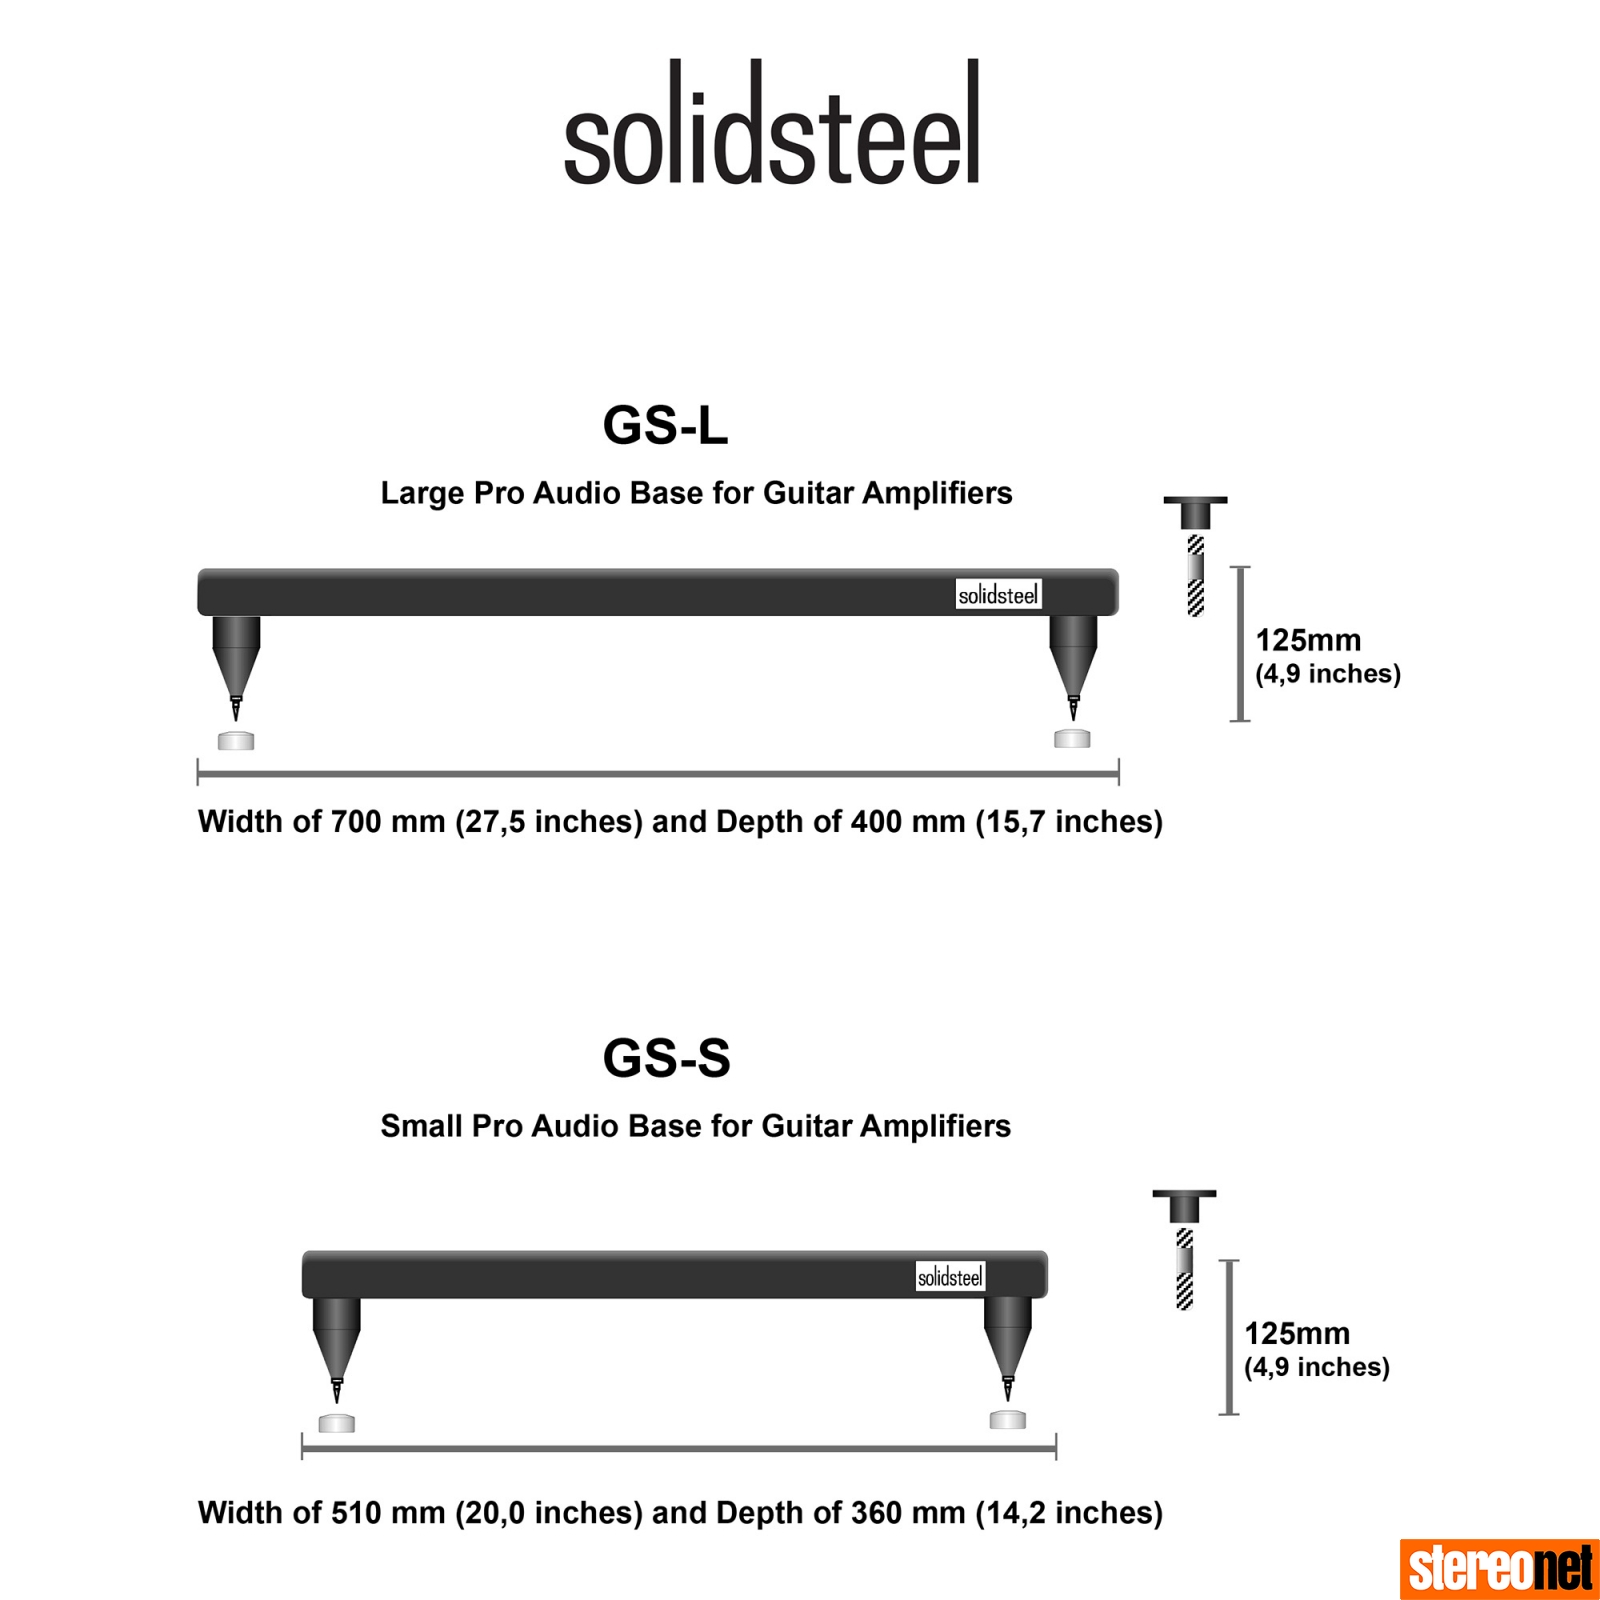 Solidsteel VibeStand review